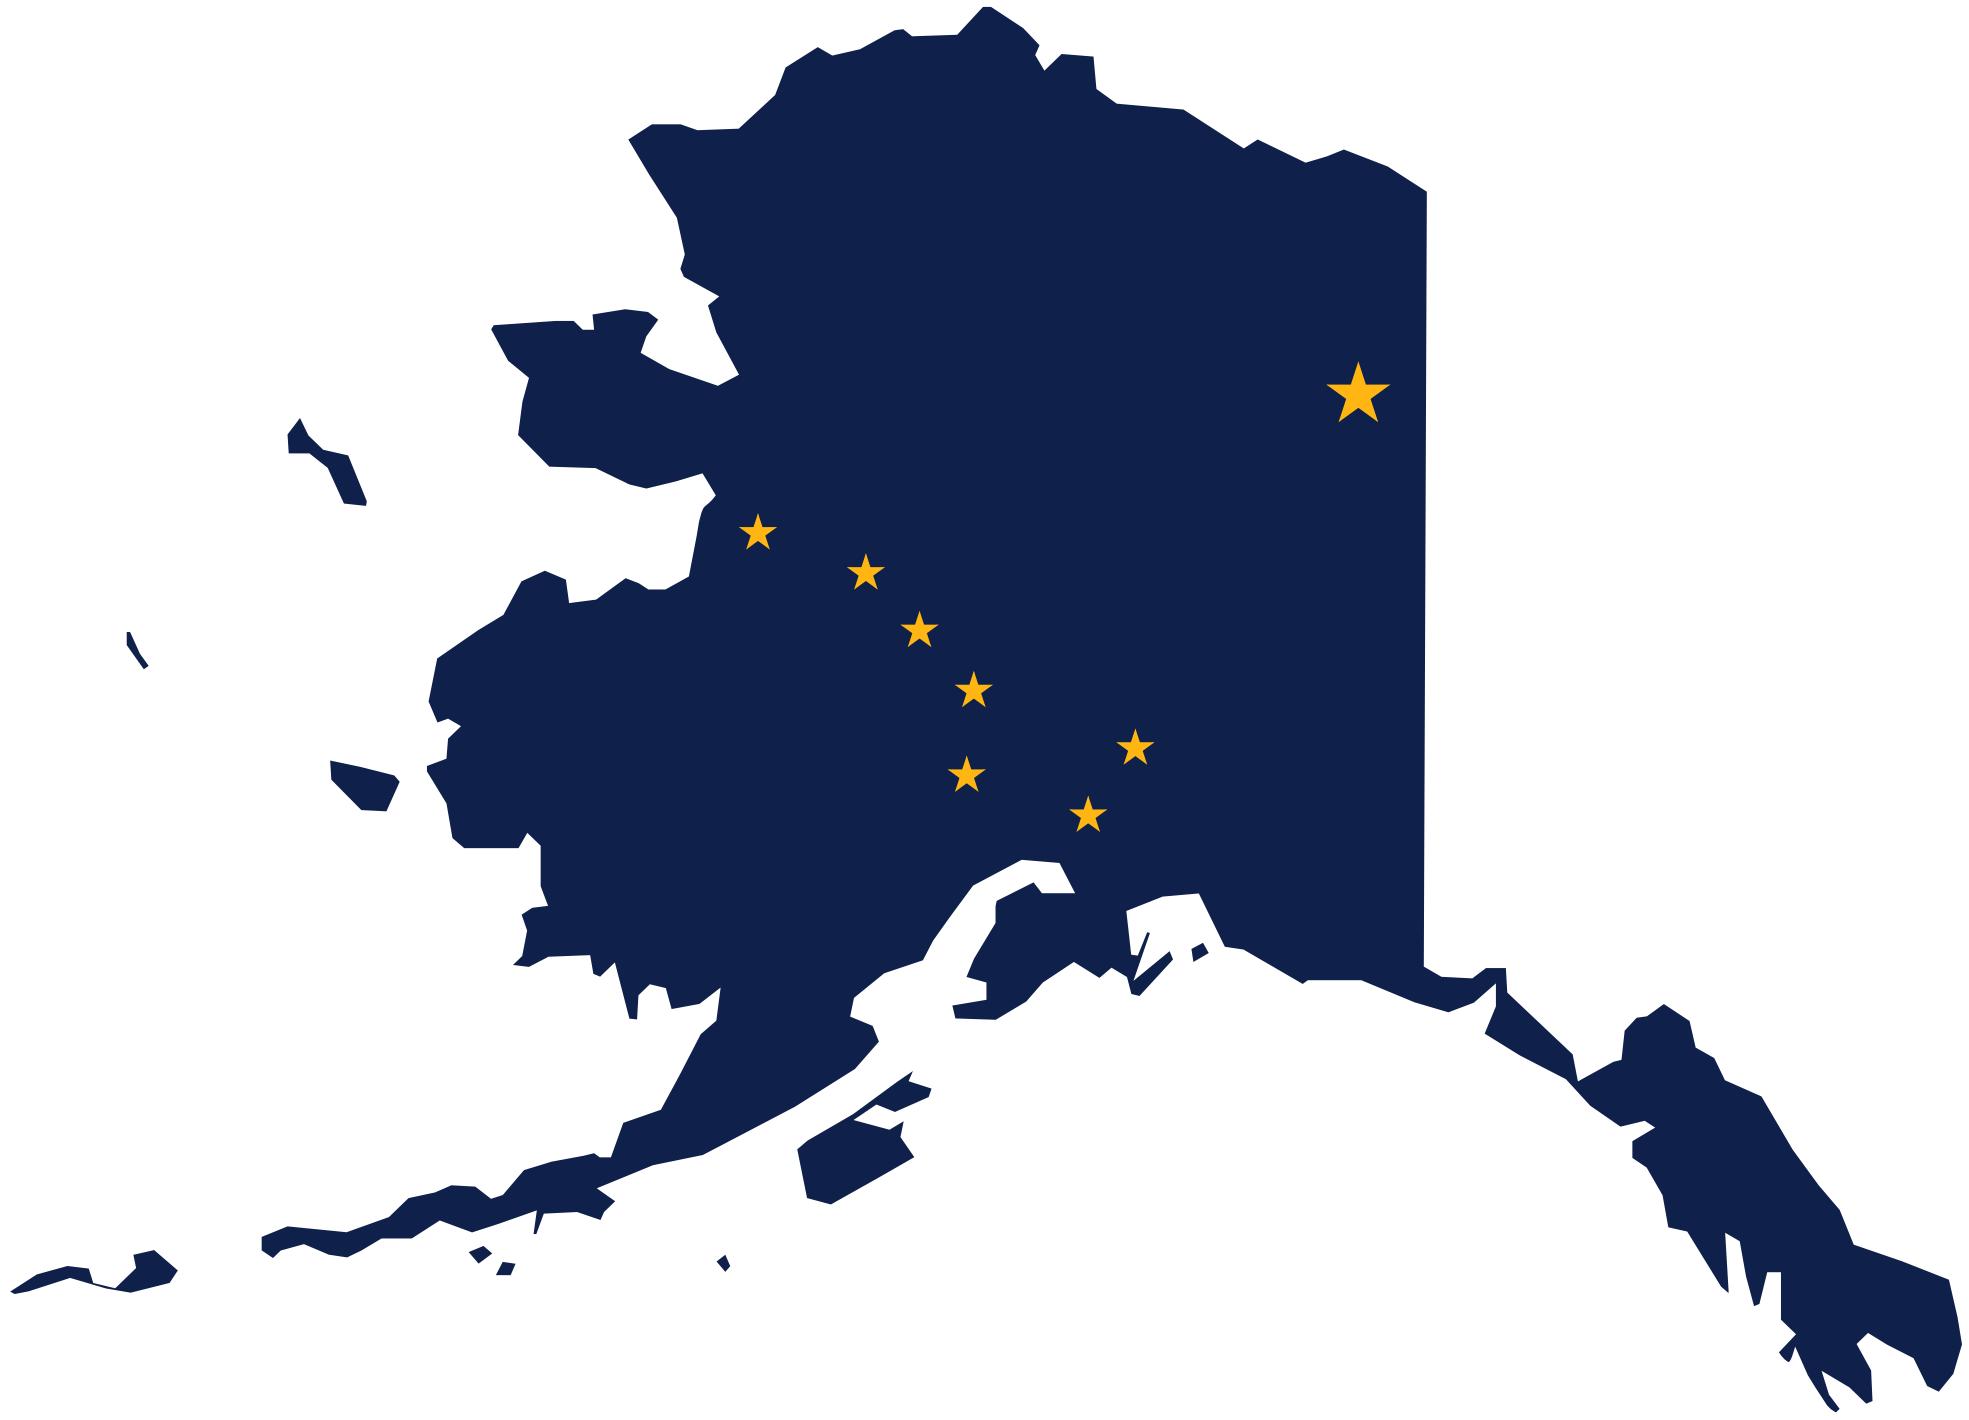 Alaska Clipart Flag Map Of Alaska 1969px-Alaska Clipart Flag Map Of Alaska 1969px Png-14